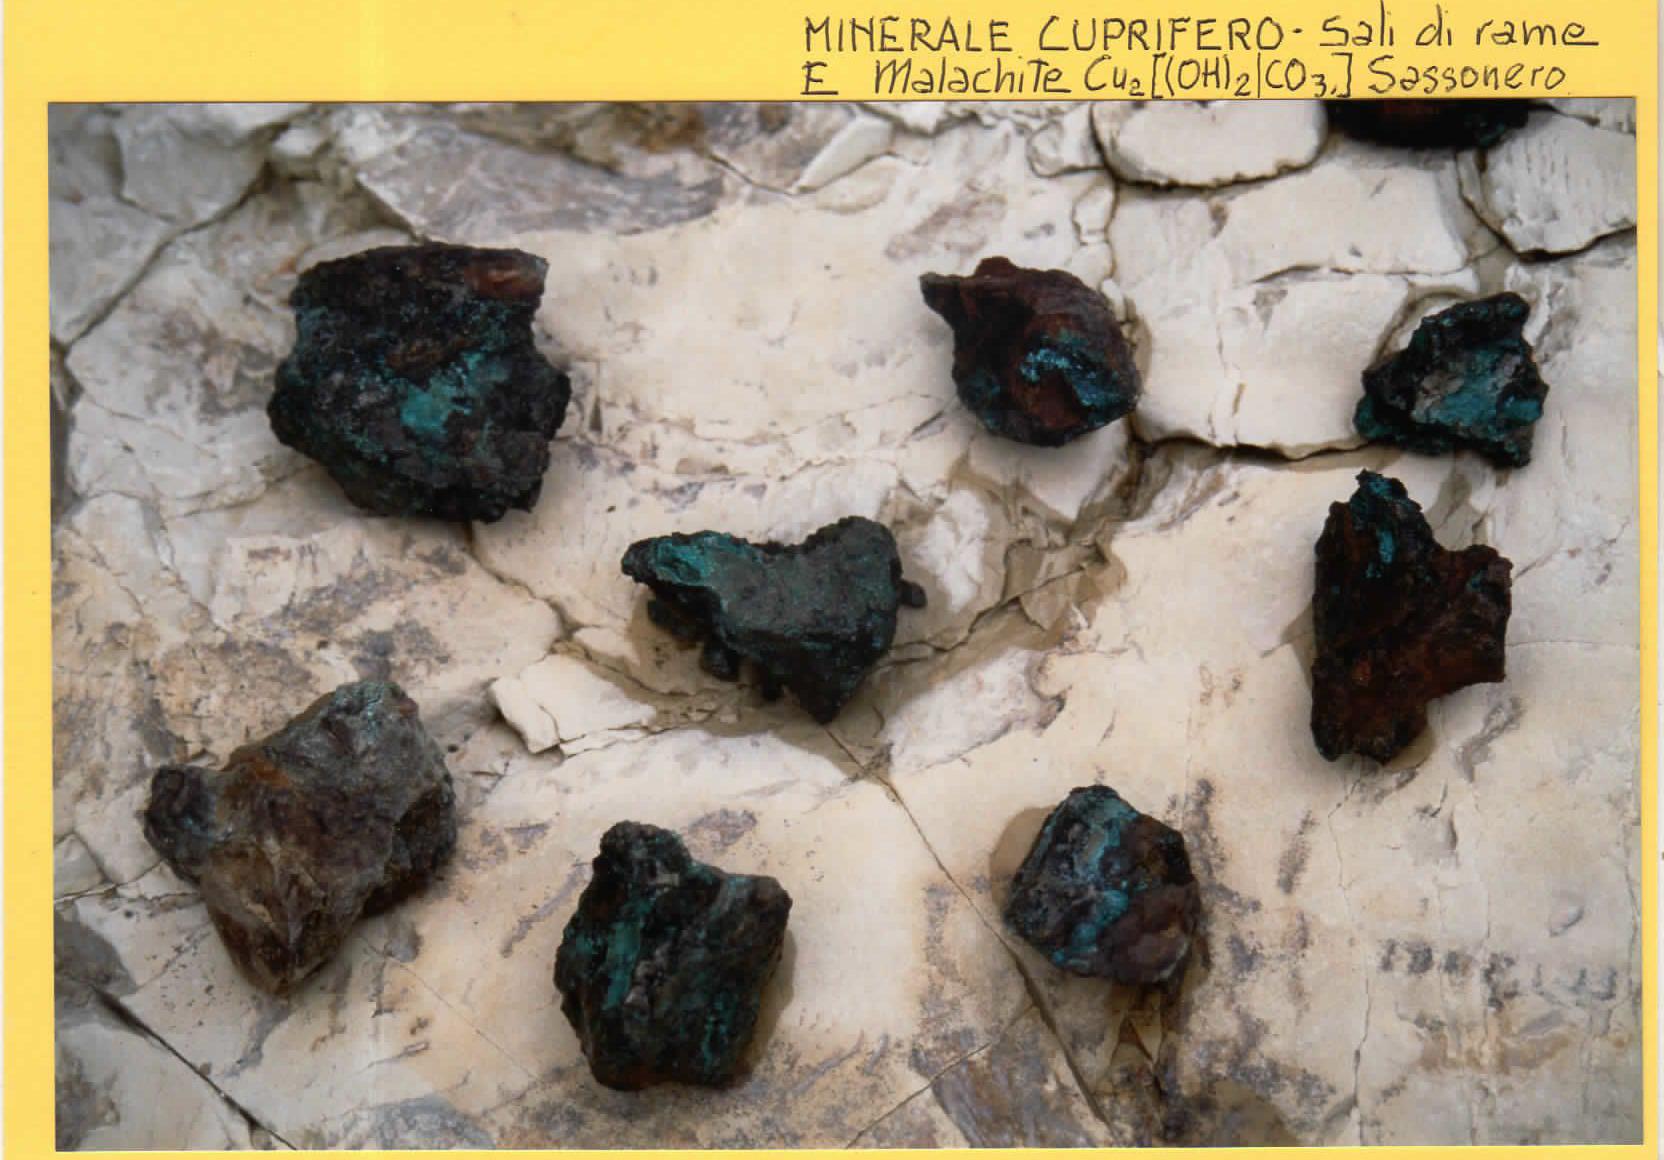 Minerale Cuprifero - Sali di Rame e Malachite